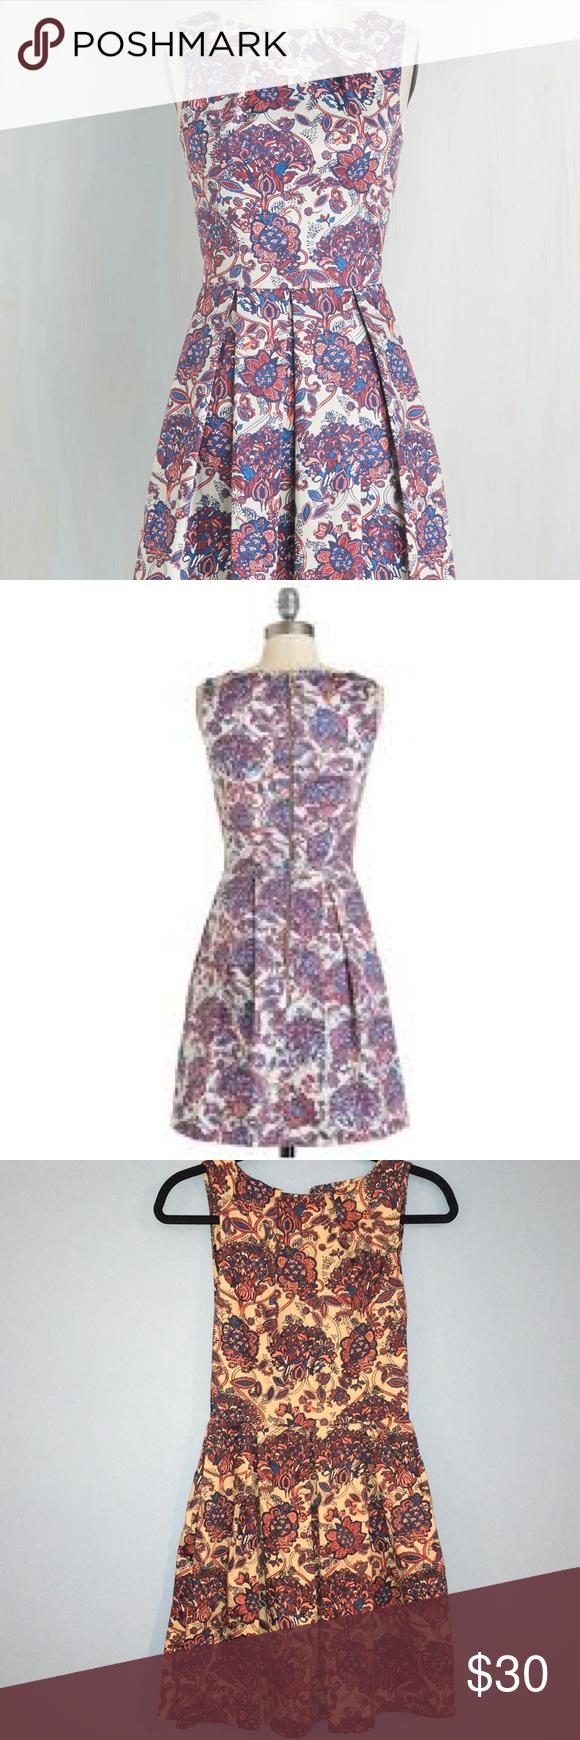 Closet London Luck be a lady dress in potpourri XS Closet